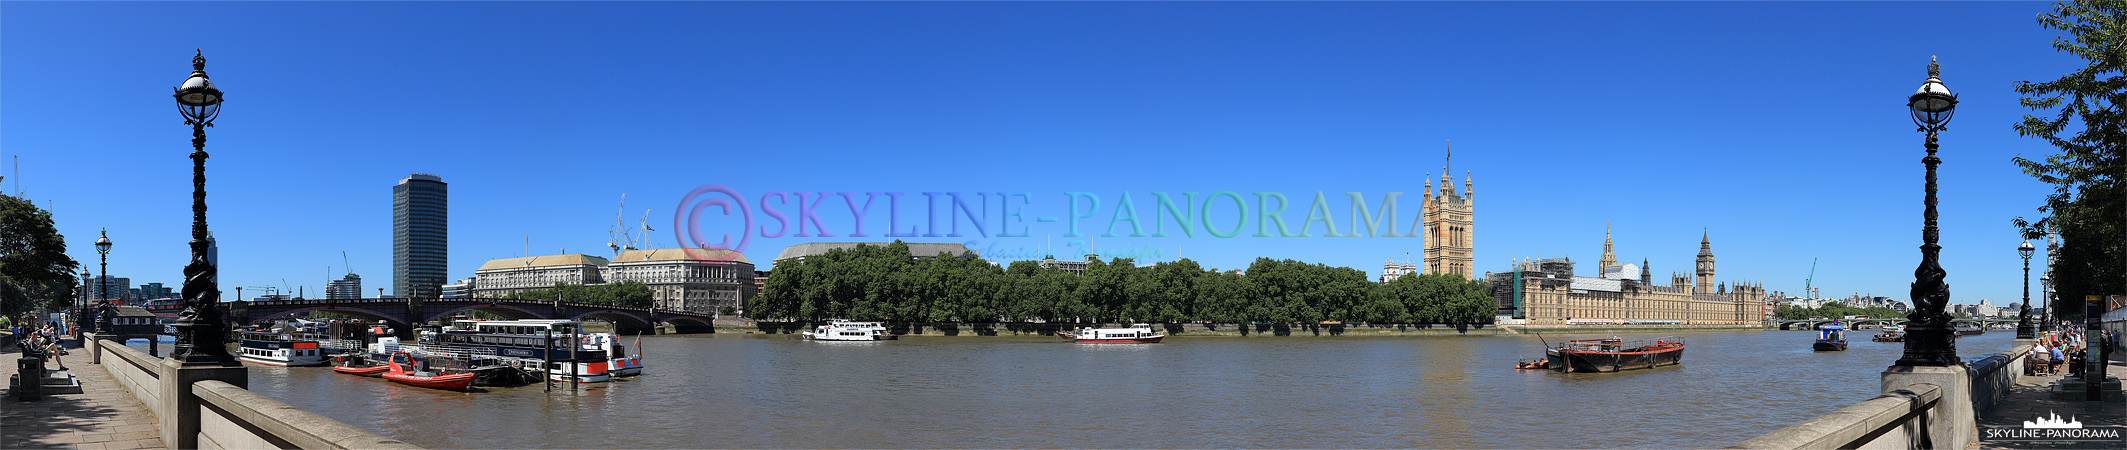 Panorama London - Themseufer